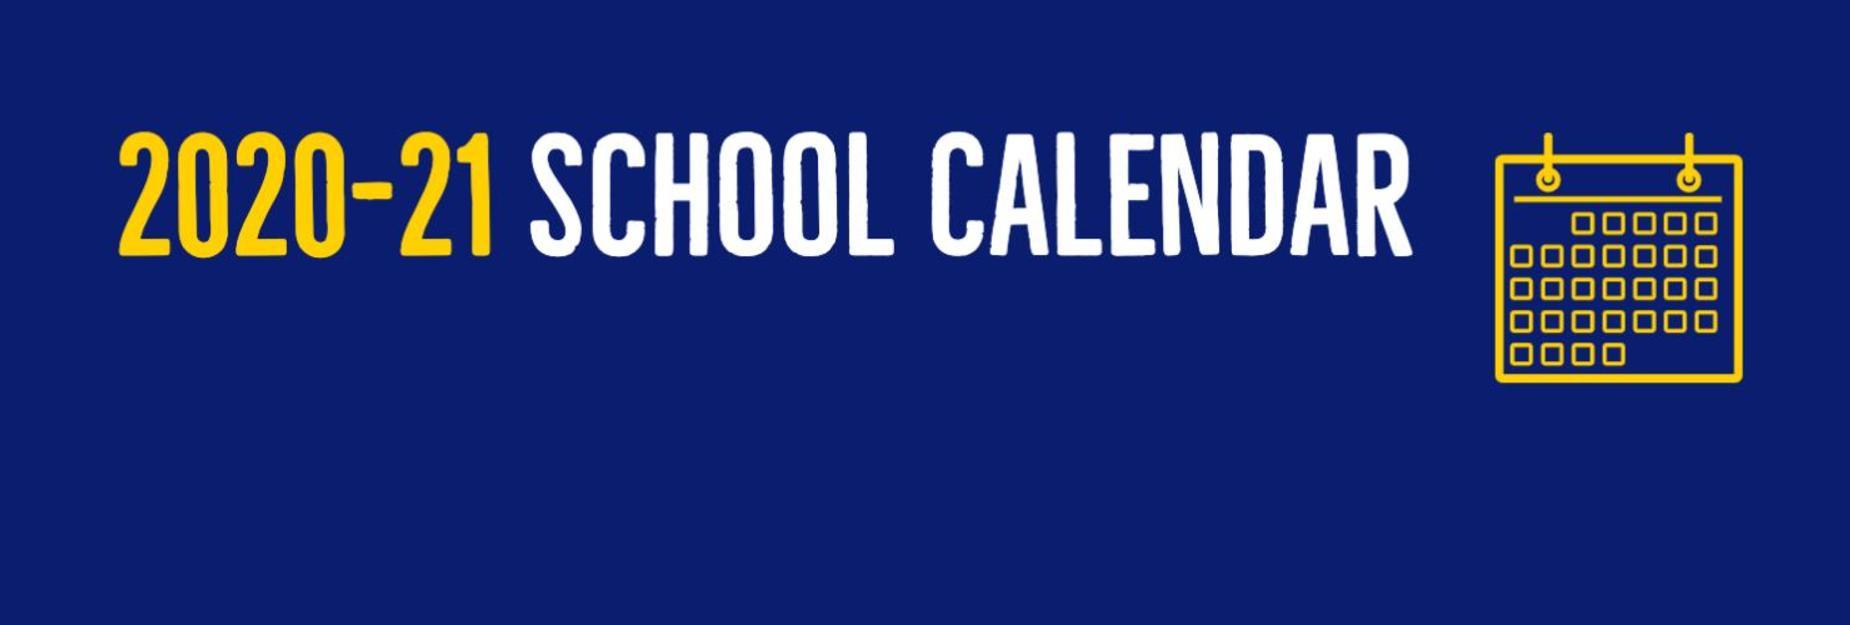 20-21 academic calendar